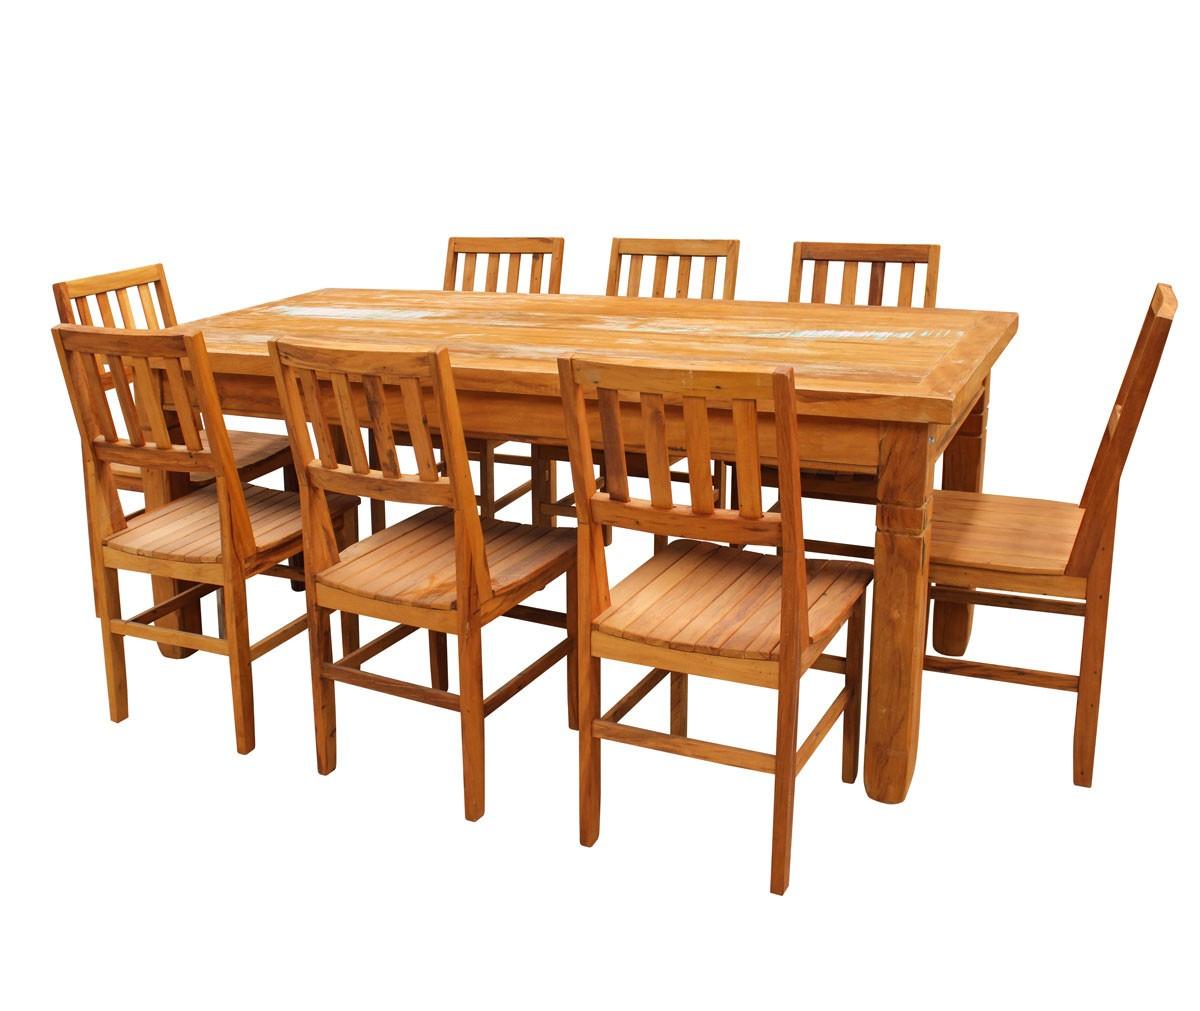 Conjunto mesa de jantar 2 5 metros 8 cadeiras ana hickman for Mesa 2 metros comensales